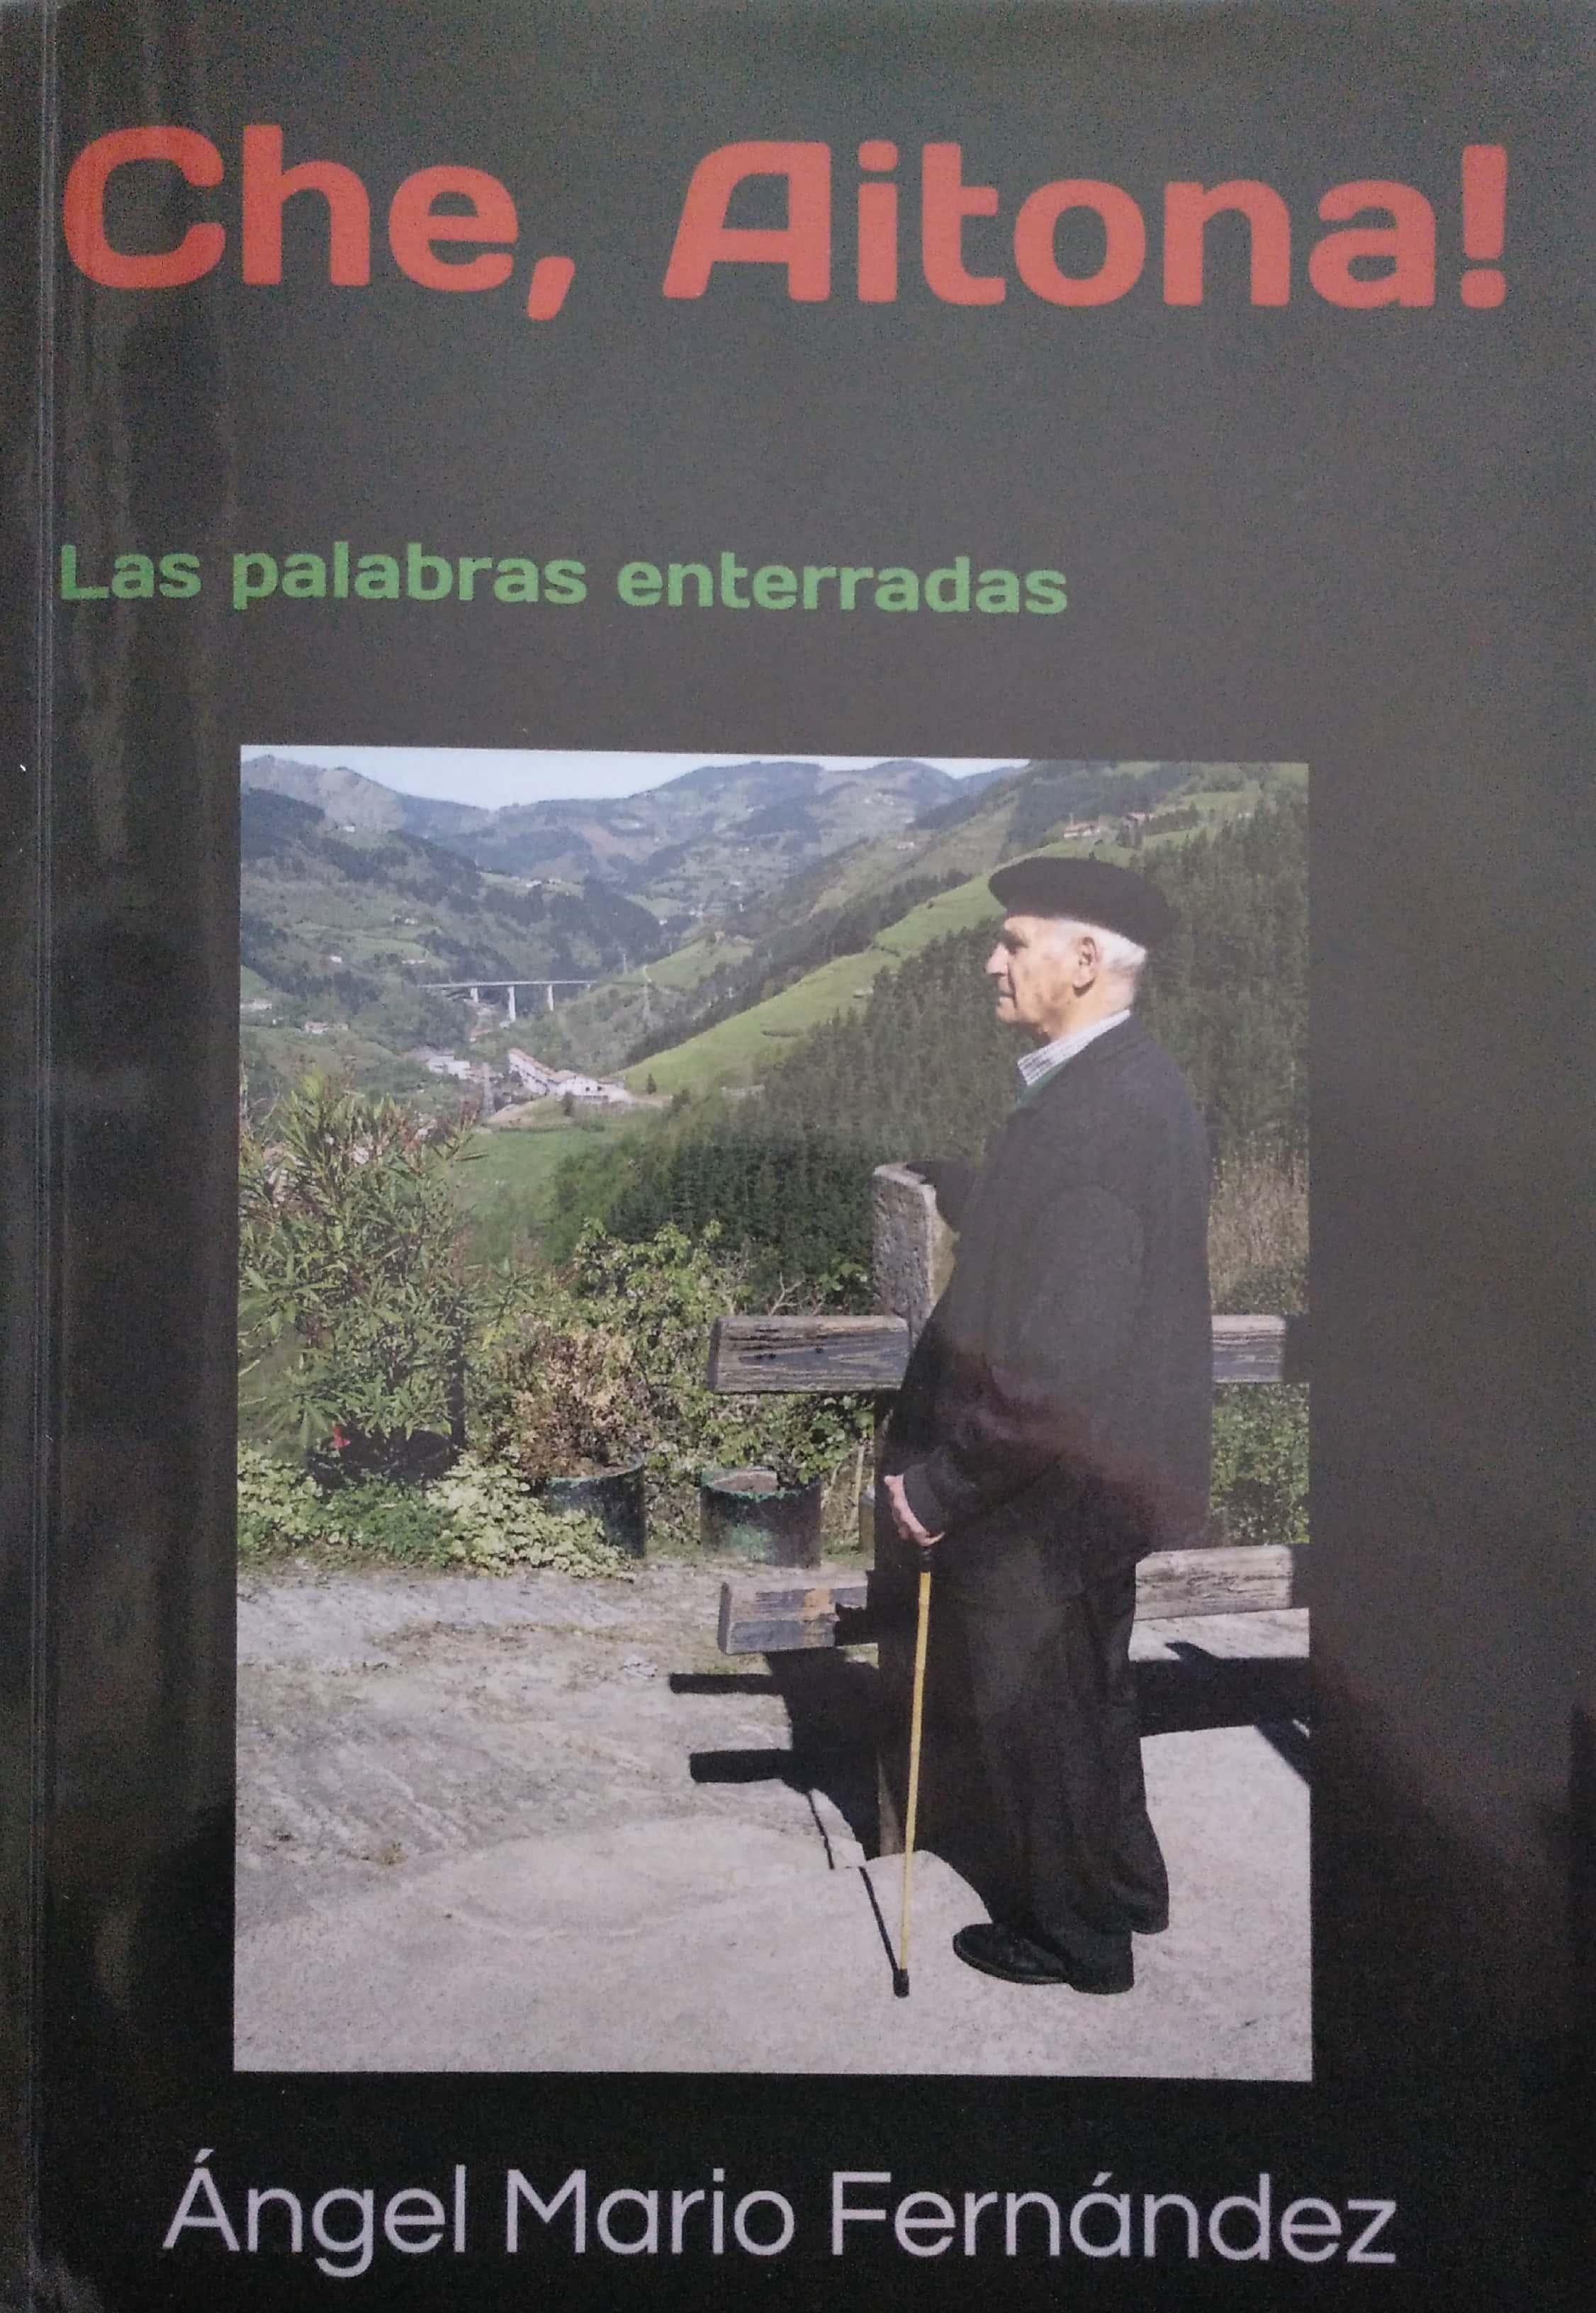 """Che, aitona! Las palabras enterradas"" liburuaren aurkezpena (Angel Mario Fernandez) @ Portalea. Areto Nagusia"